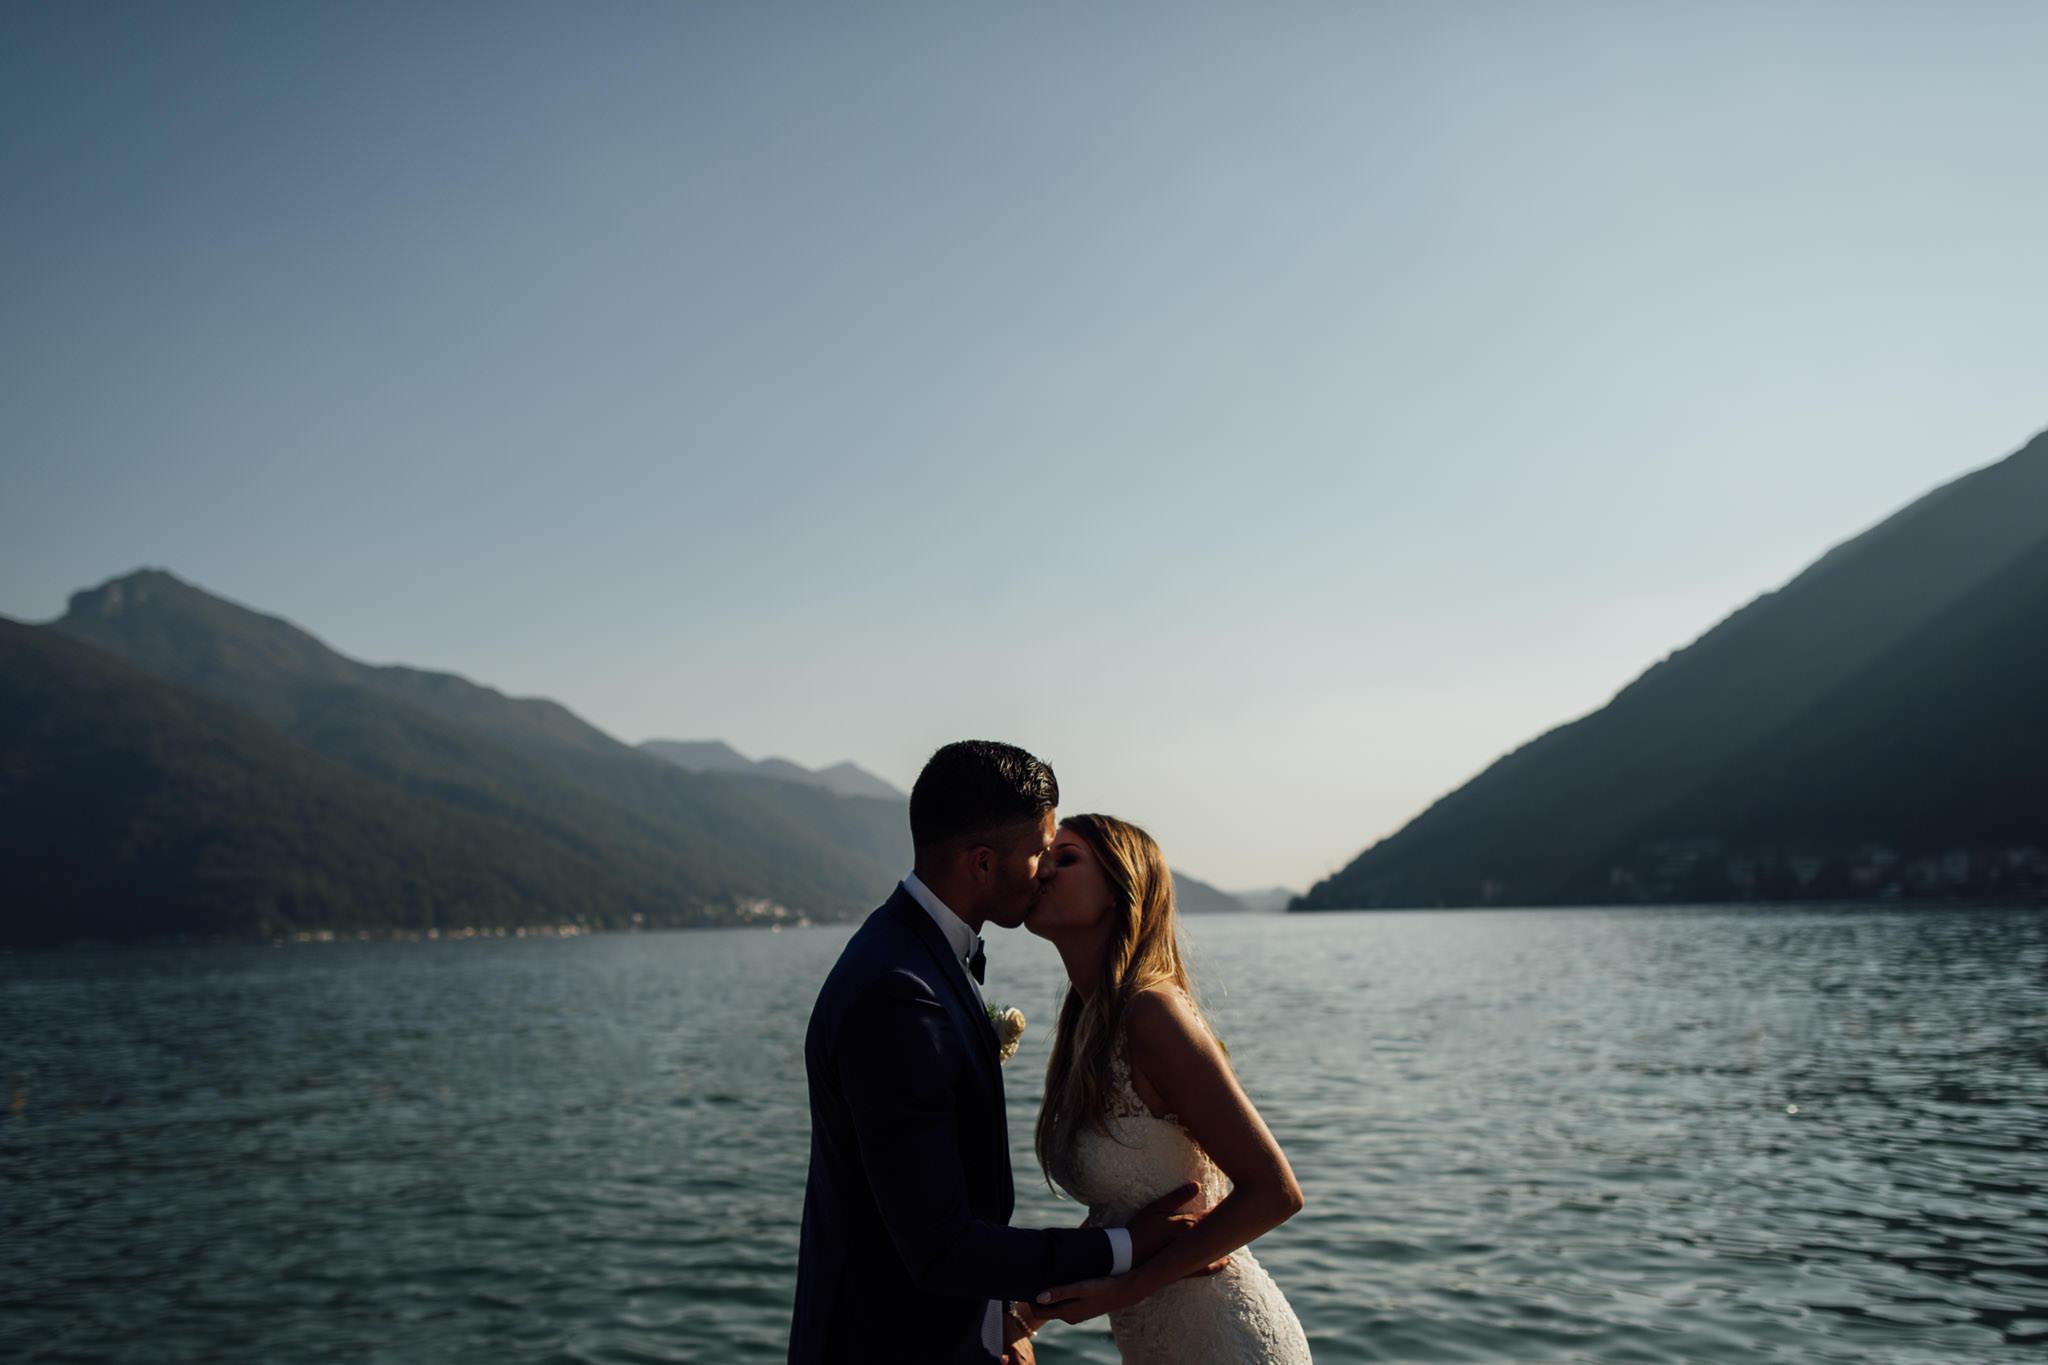 fotografia_di_matrimonio_portfolio-1125